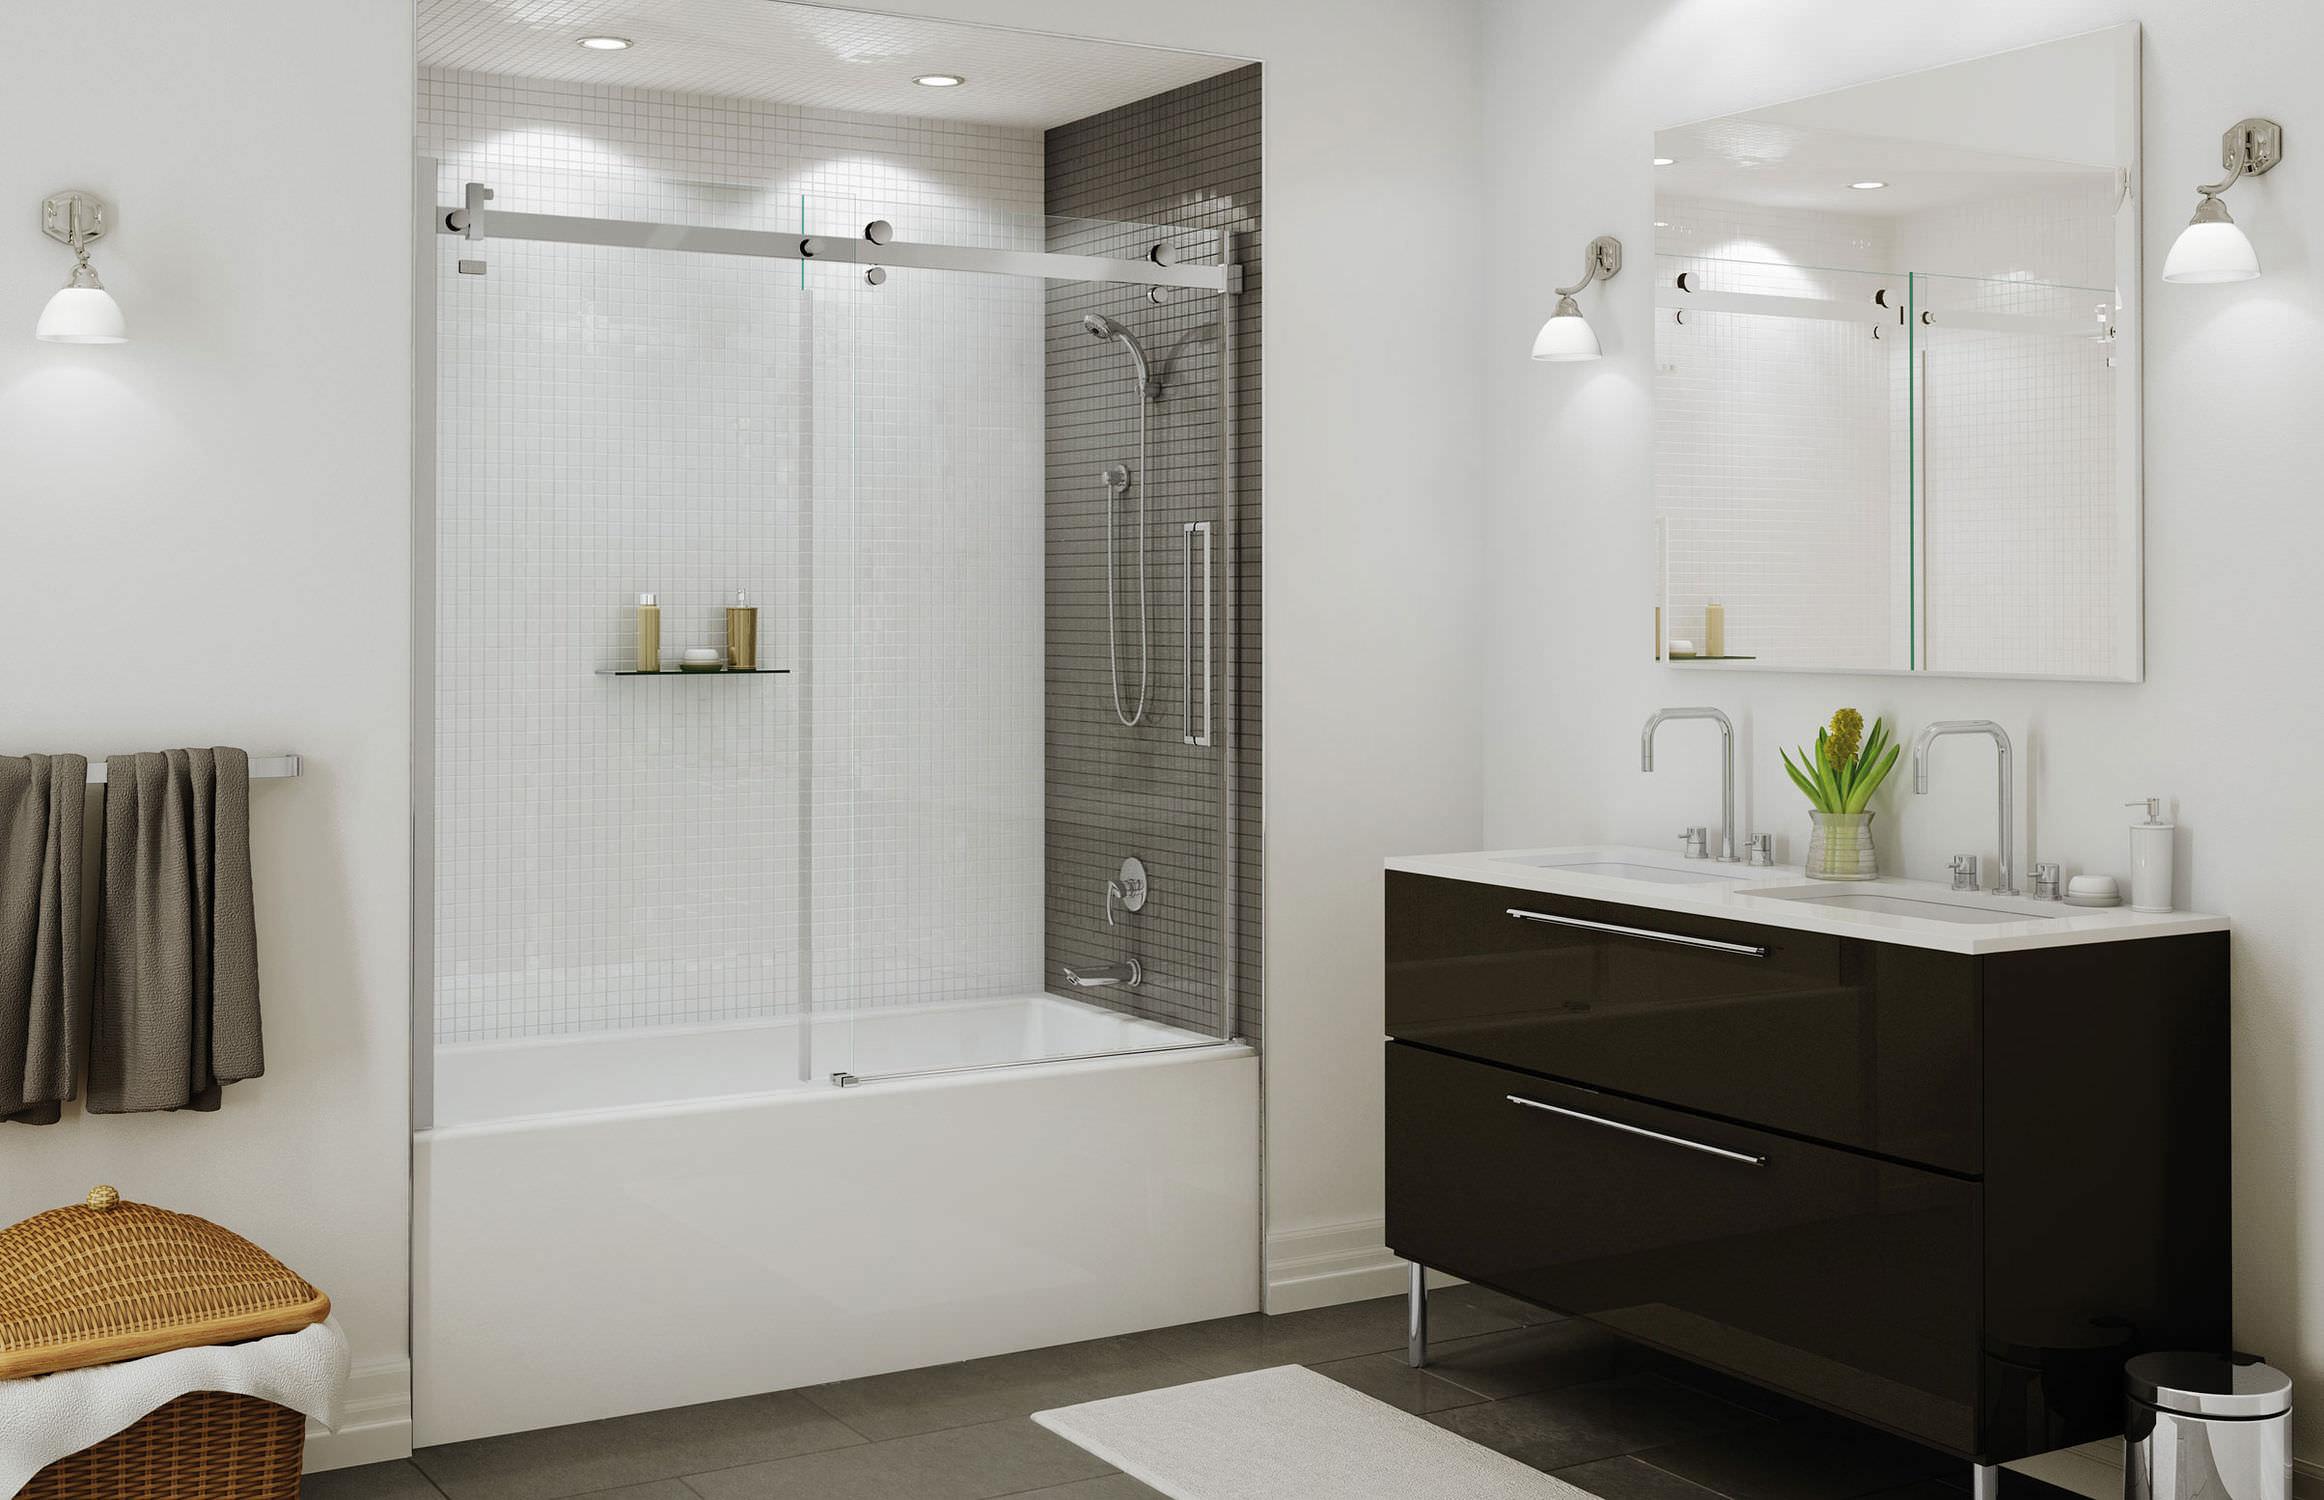 Sliding Bath Screen Tempered Glass Halo Maax Bathroom